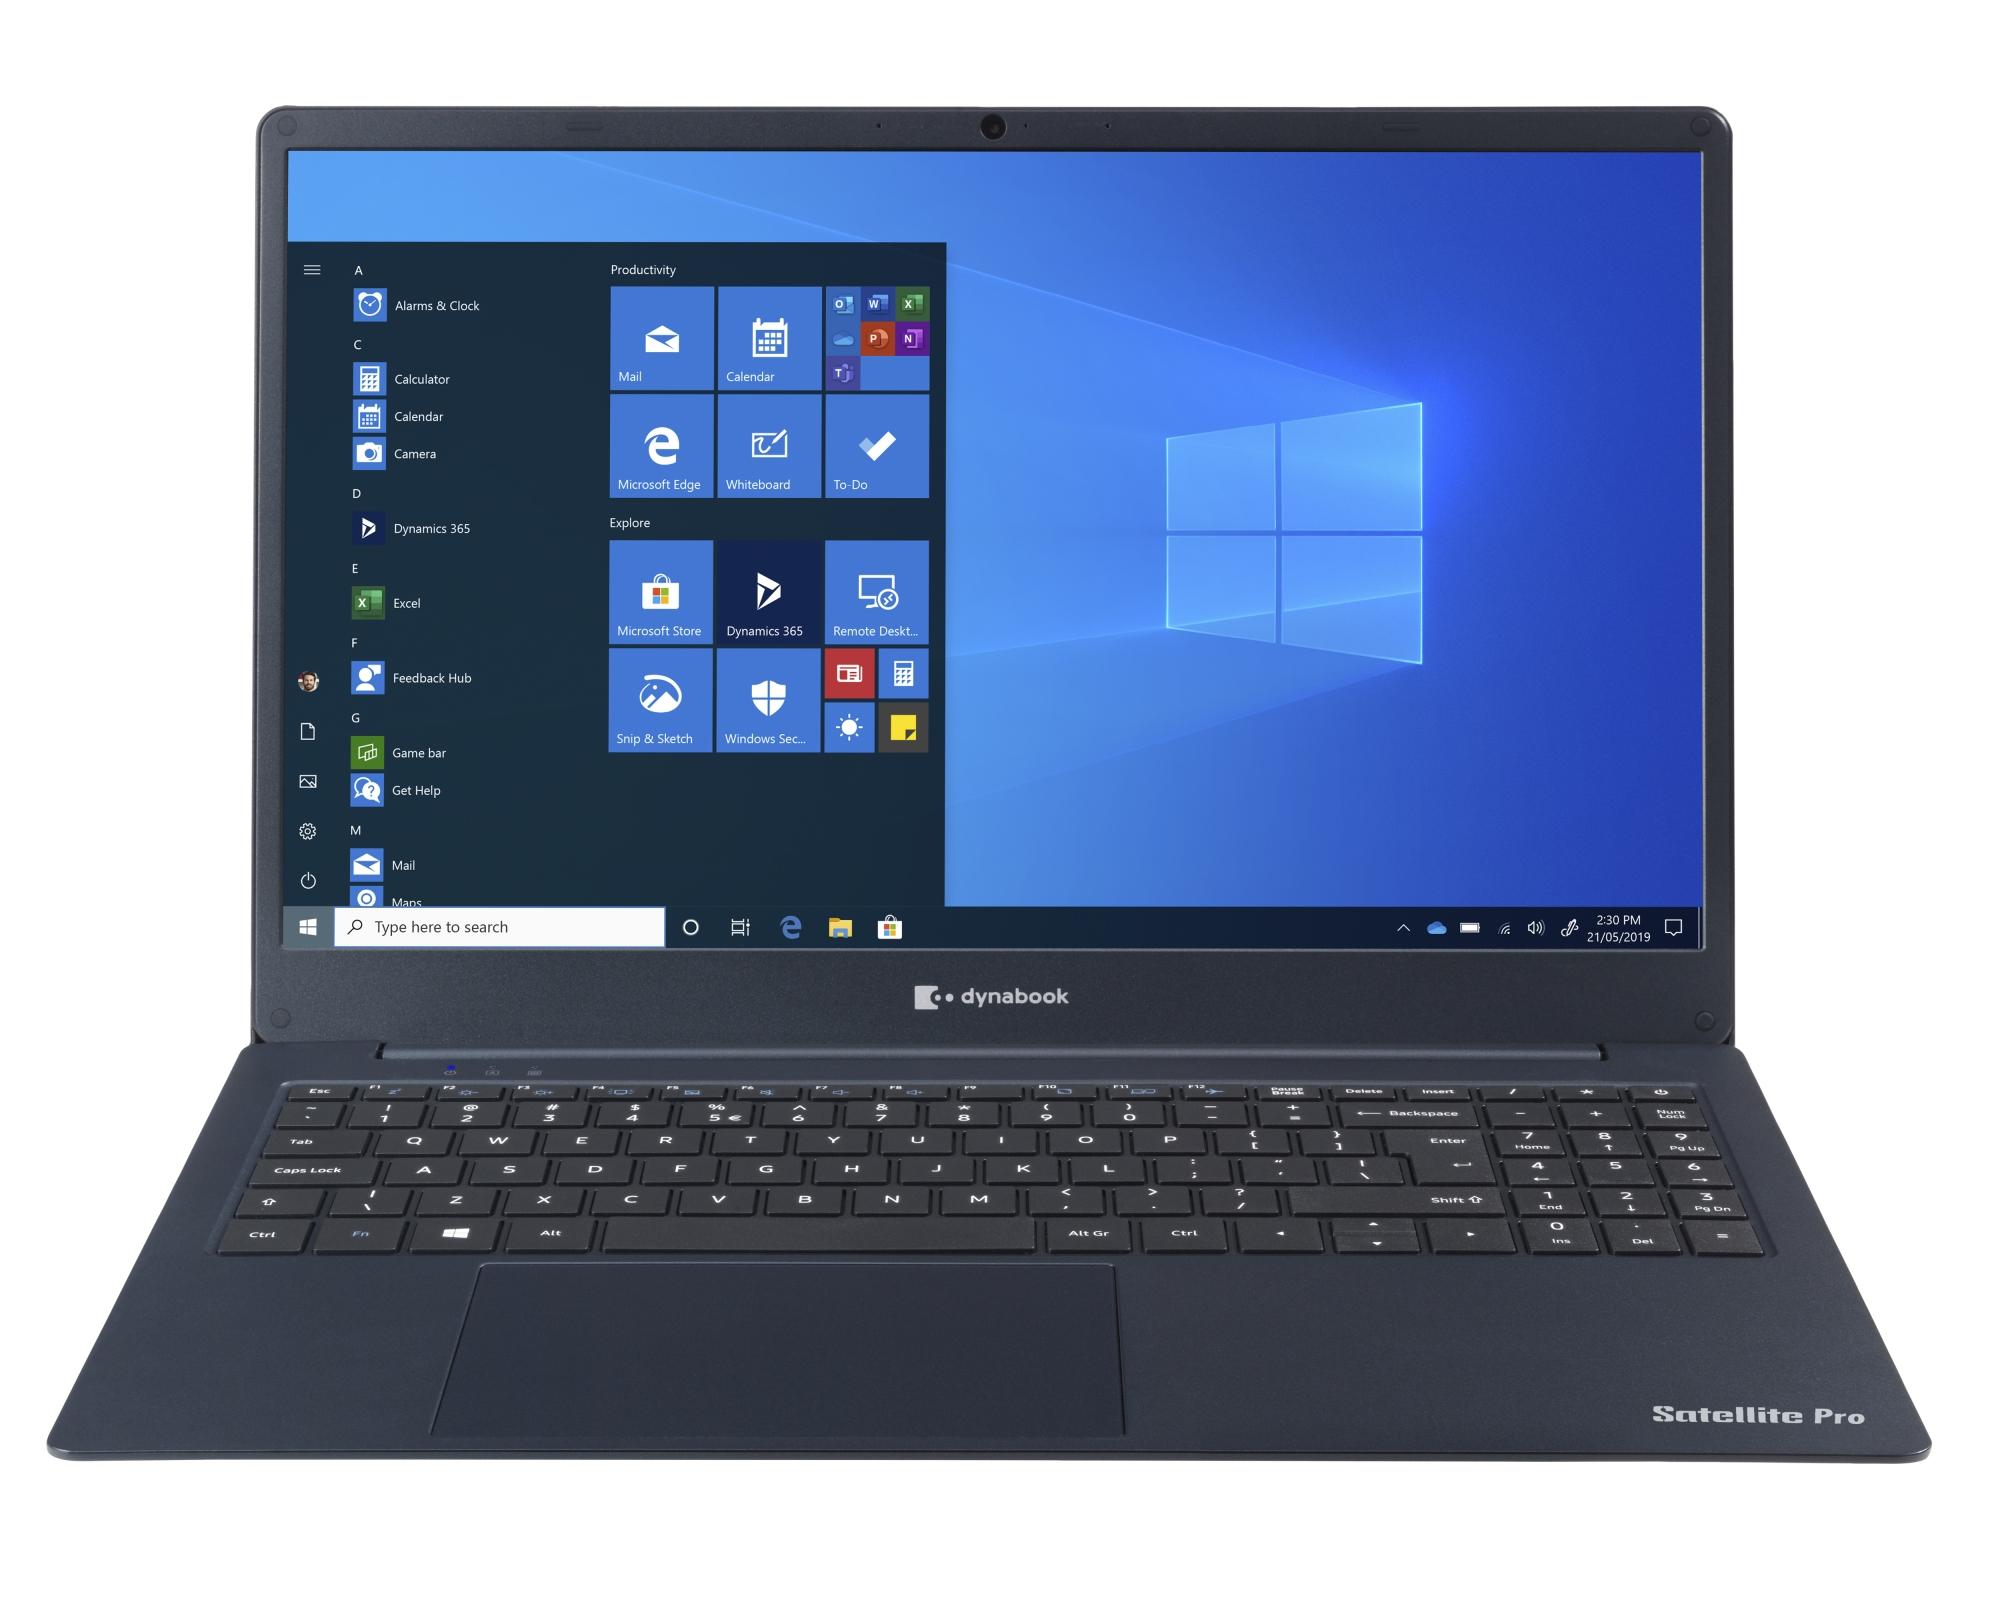 "SATELLITE PRO C50-E-101 PORTáTIL AZUL 39,6 CM (15.6"") 1920 X 1080 PIXELES 8ª GENERACIóN DE PROCESADORES INTEL® CORE™ I5 8 GB DDR4-SDRAM 512 GB SSD WI-FI 5 (802.11AC) WINDOWS 10 PRO"